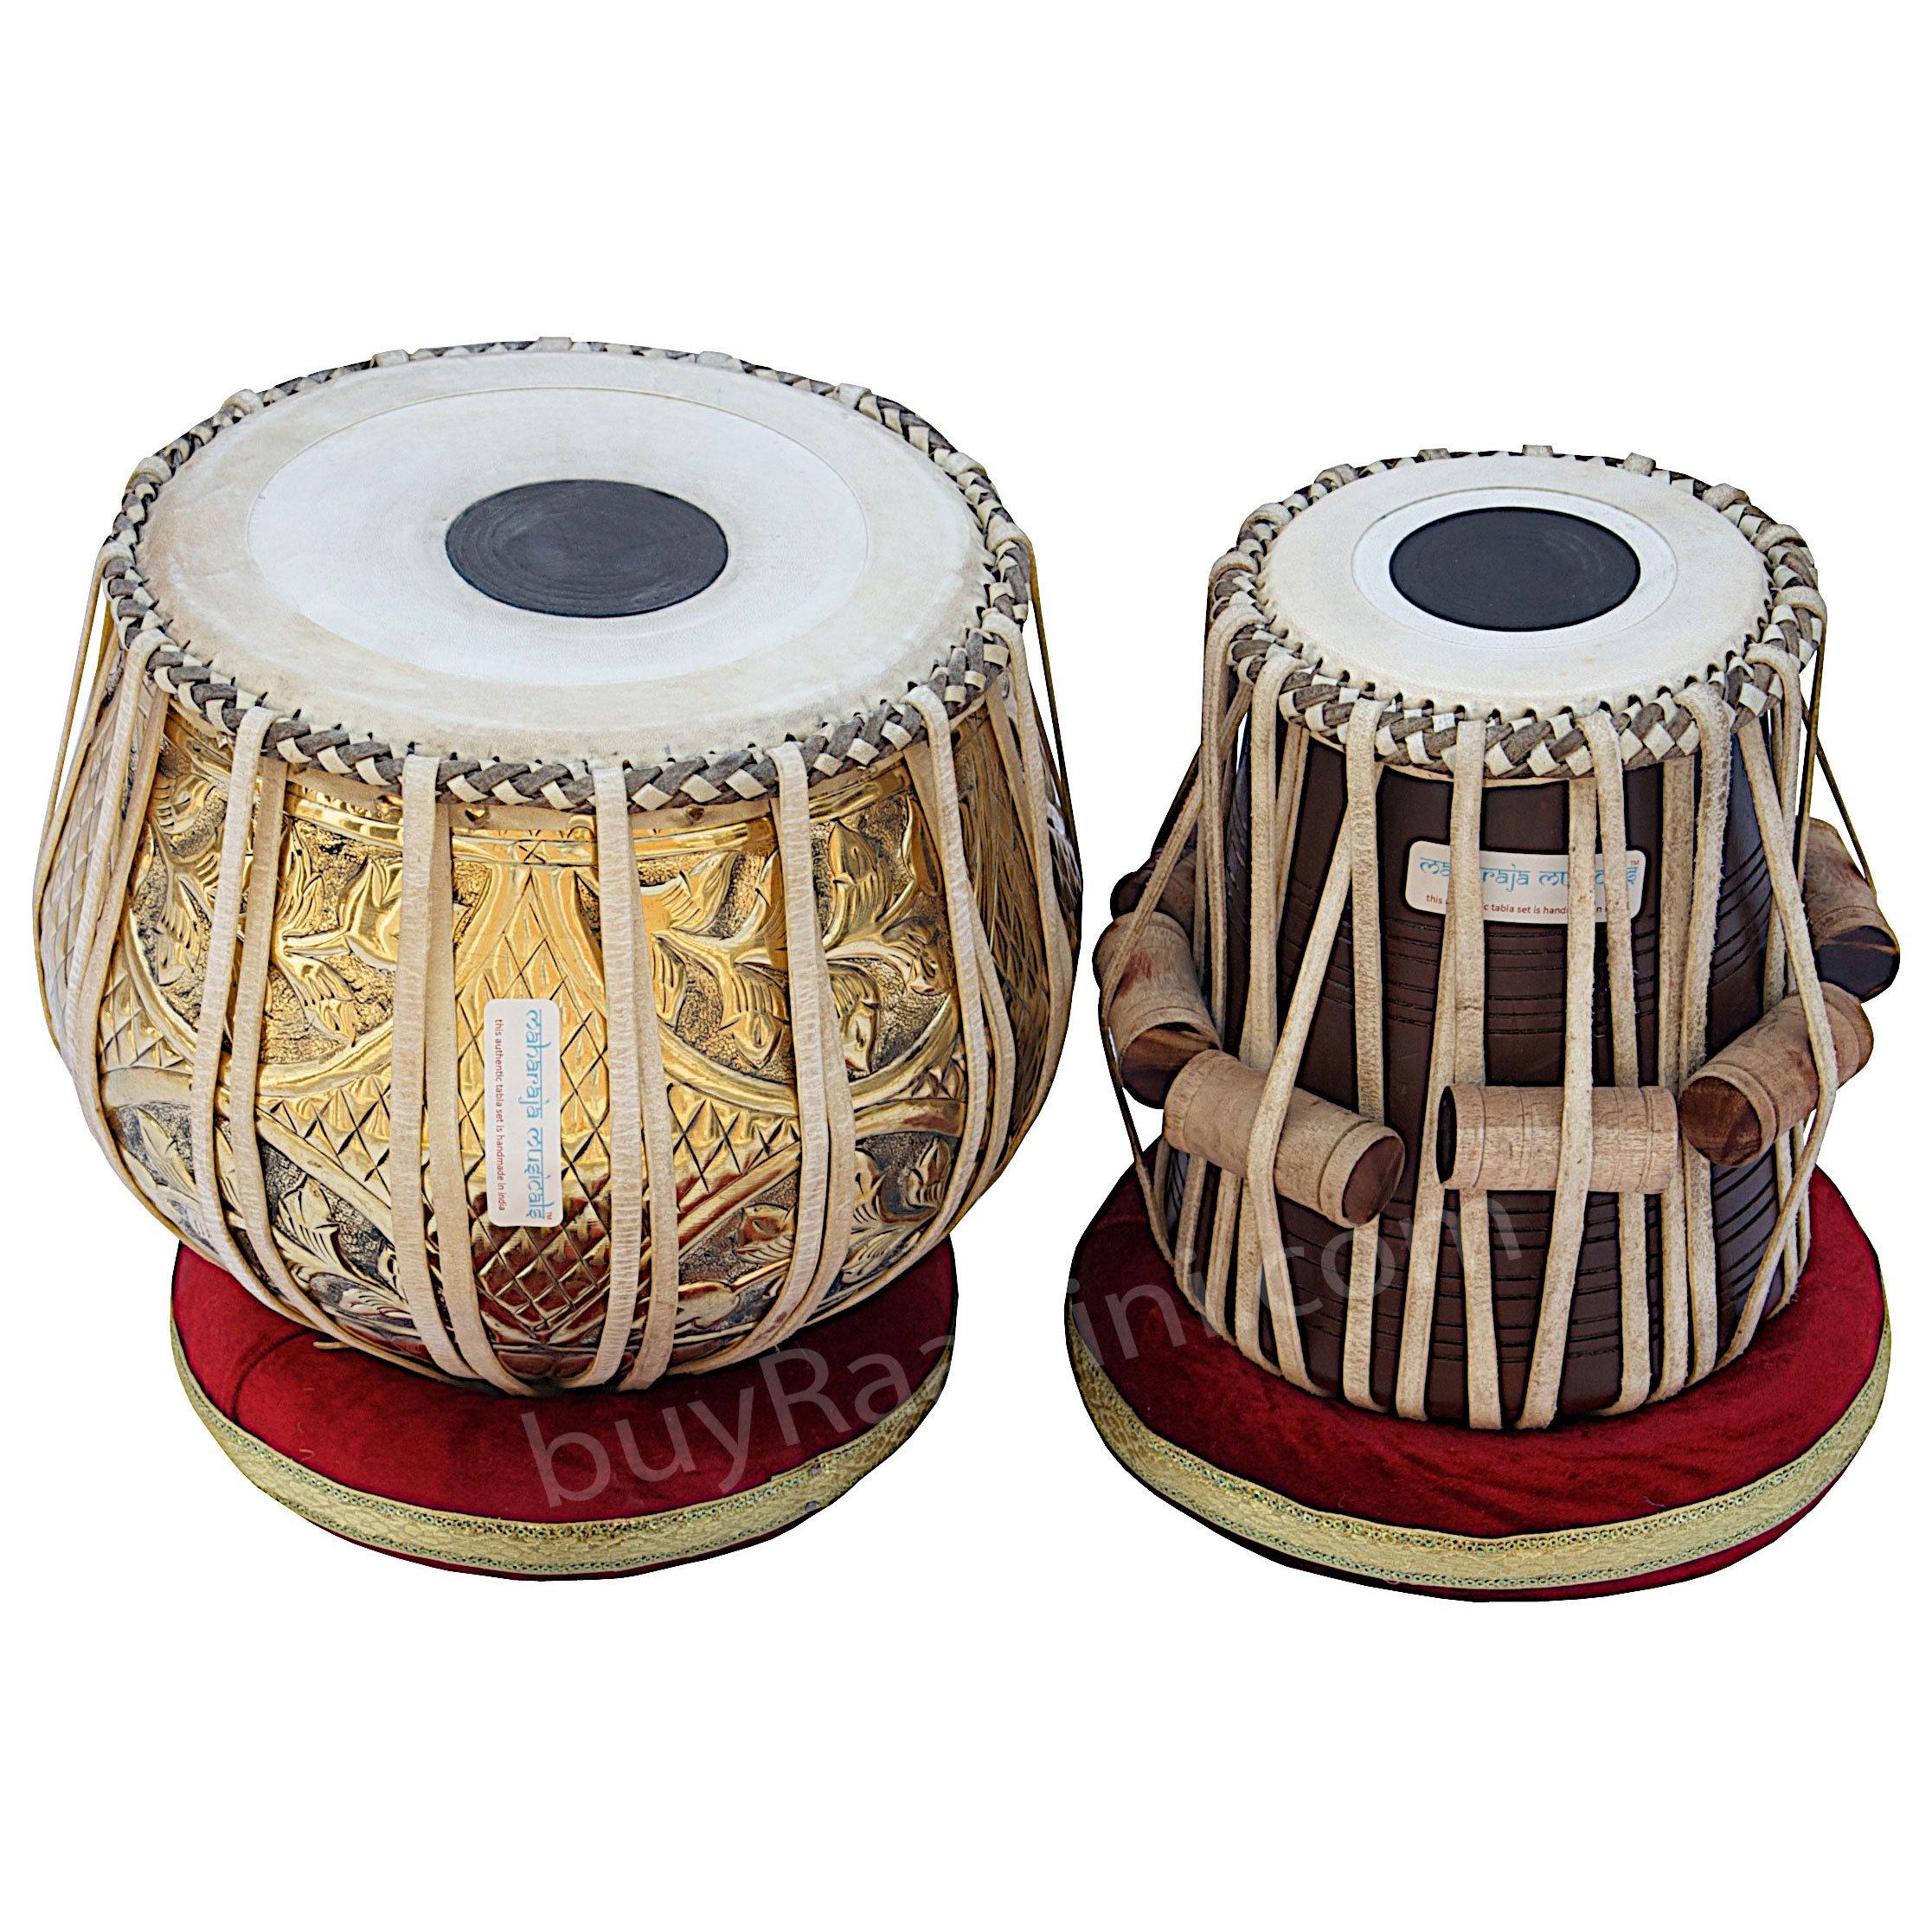 Tabla Set, Maharaja Musicals, 3.5 Kg Designer Golden Brass Bayan, Sheesham Tabla Dayan, Professional Drums, Padded Bag, Book, Hammer, Cushions, Cover, Tabla Drums Indian (PDI-FG) by Maharaja Musicals (Image #2)